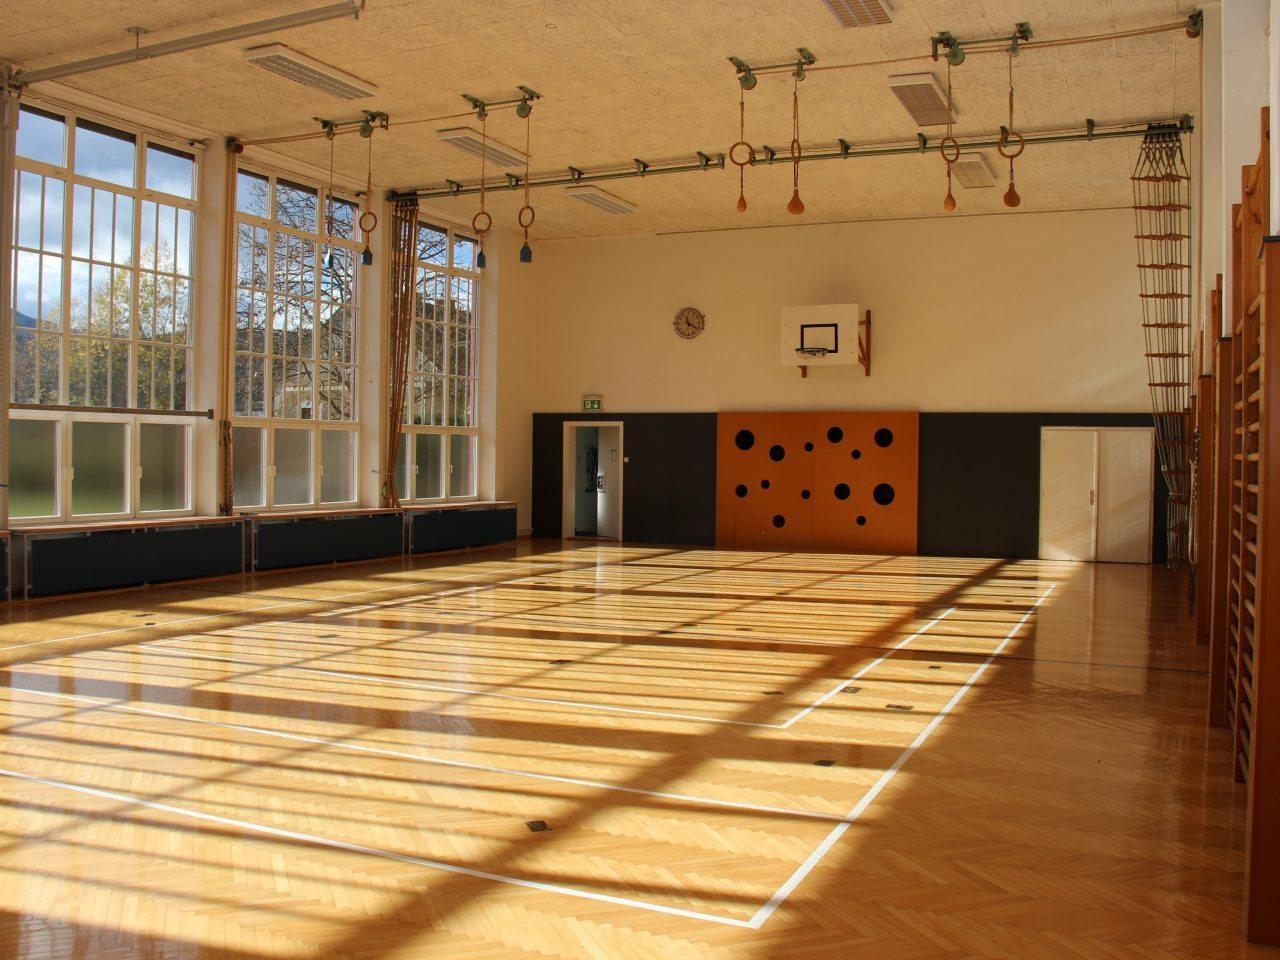 Volksschule Diemlach Turnsaal Venuzle